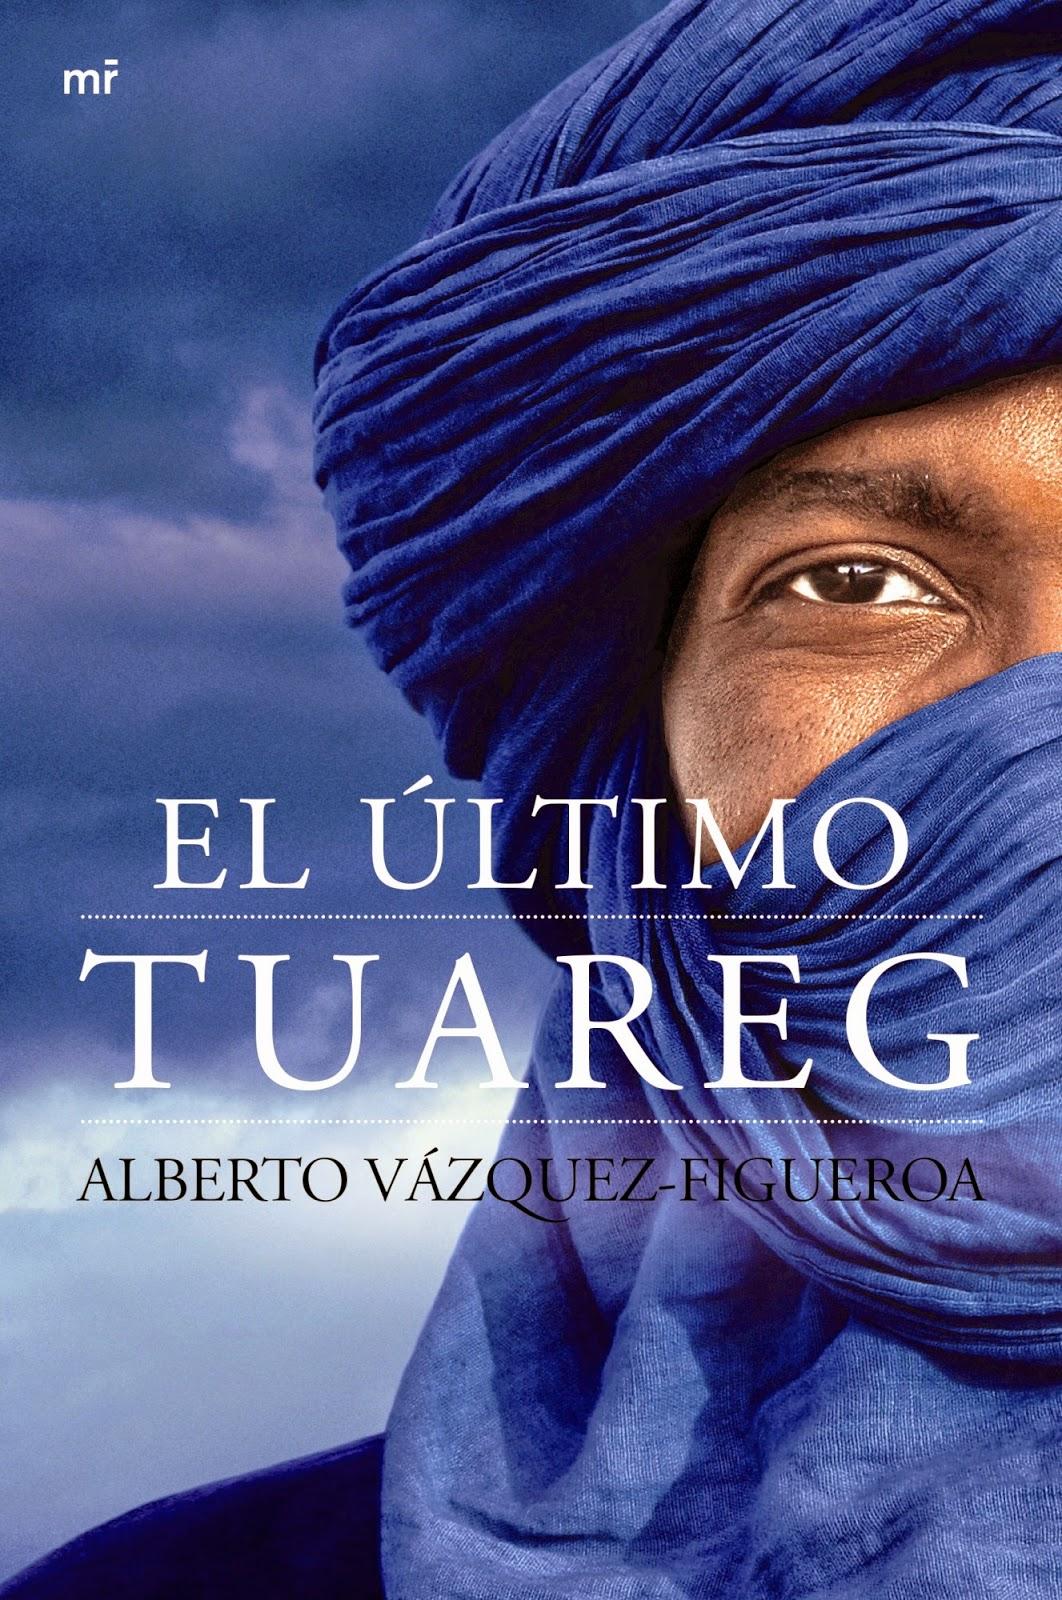 http://www.planetadelibros.com/el-ultimo-tuareg-libro-117321.html